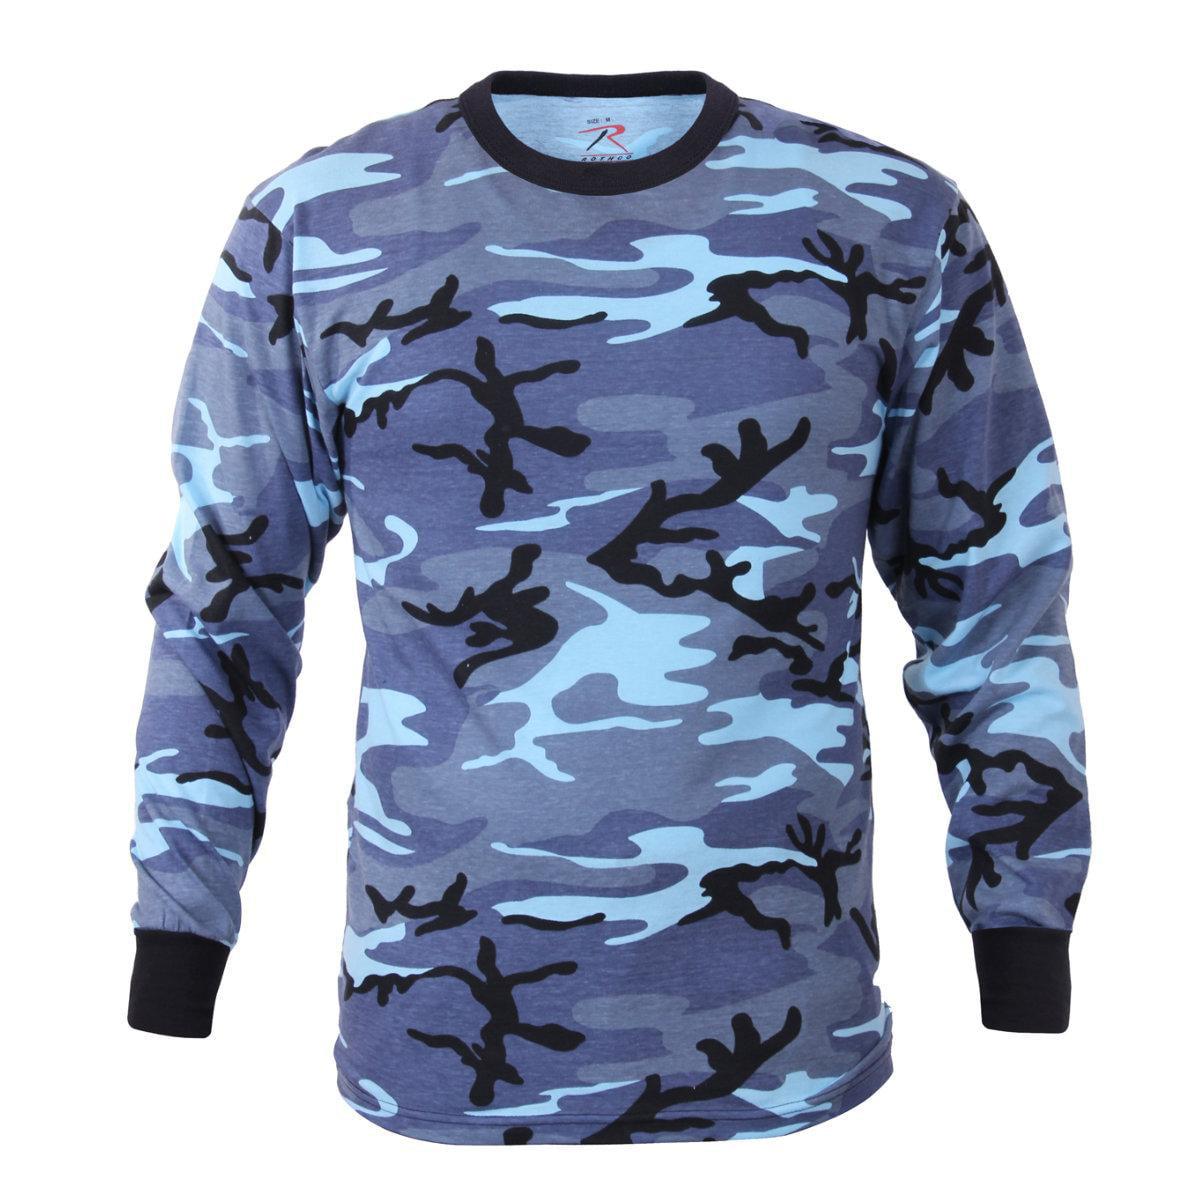 Rothco - Long Sleeve Camouflage T-Shirt 81ac4b87be5